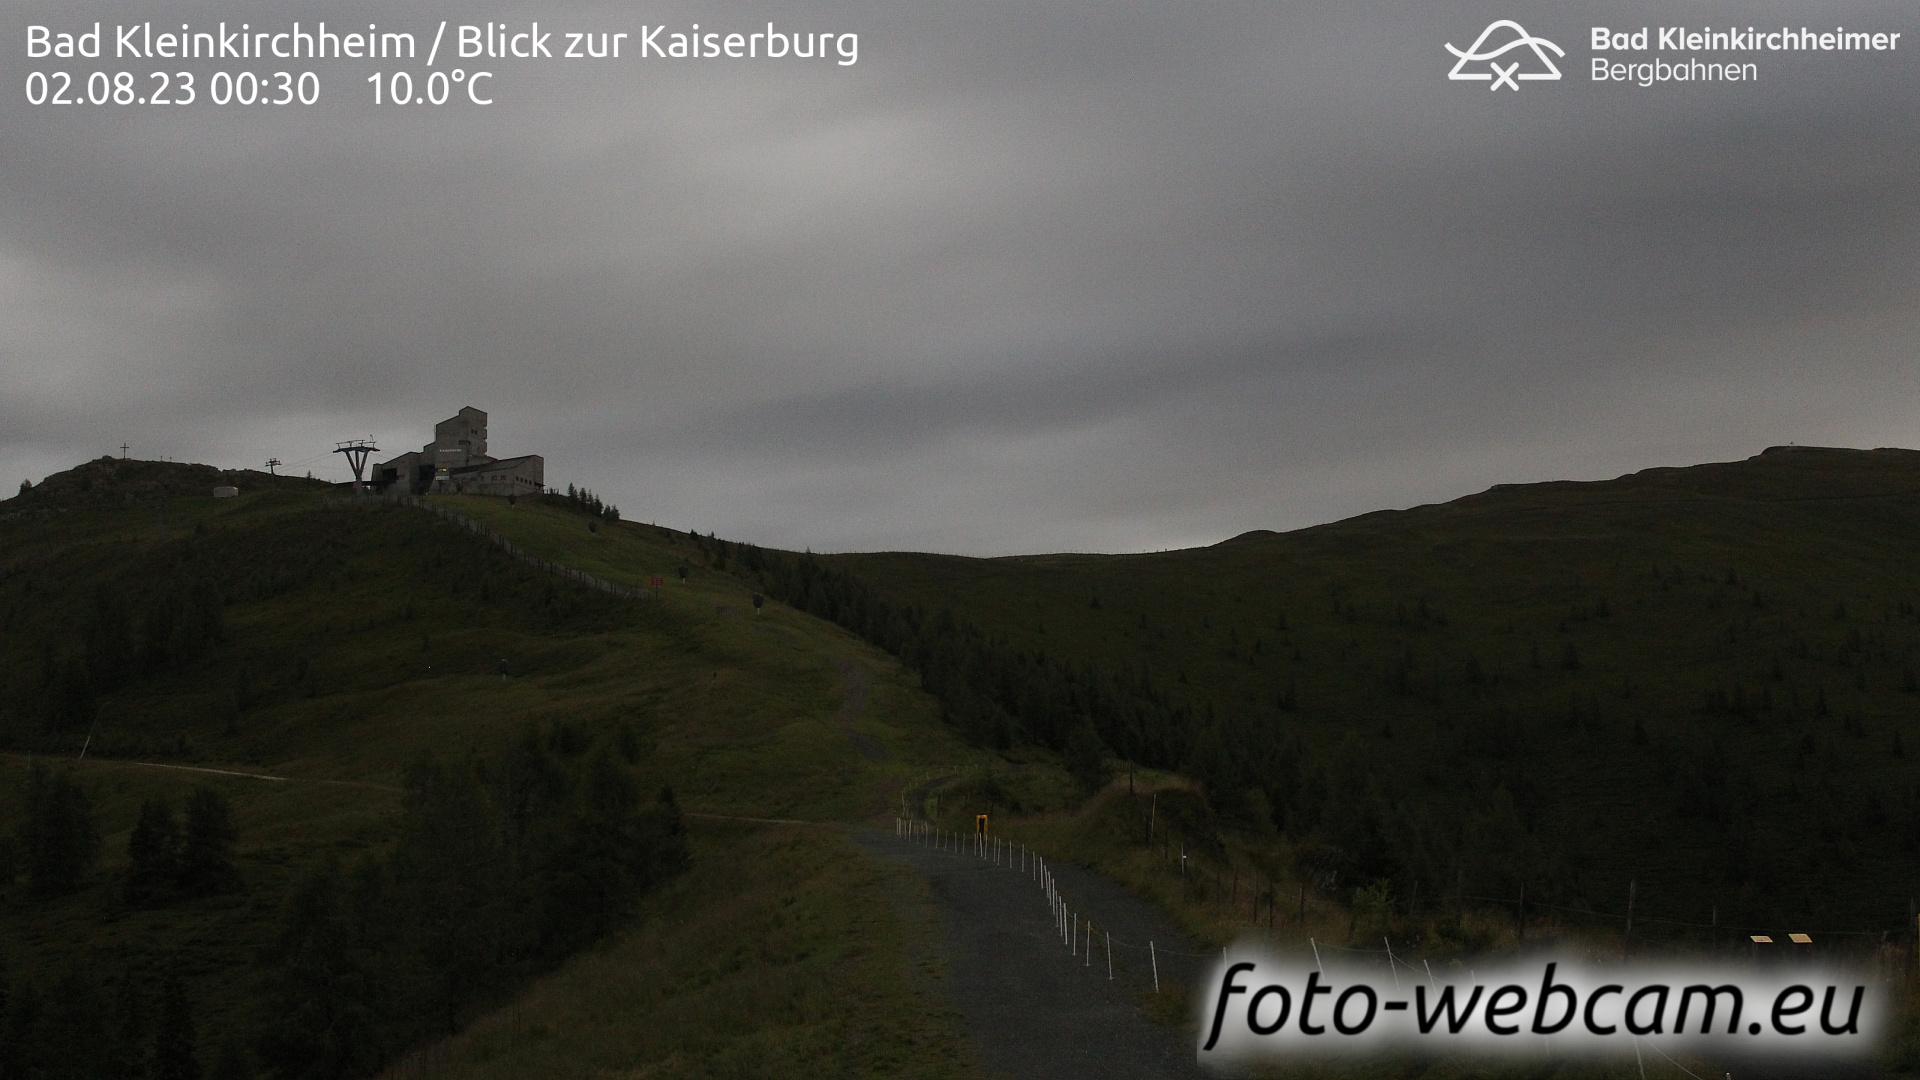 Bad Kleinkirchheim Thu. 00:23